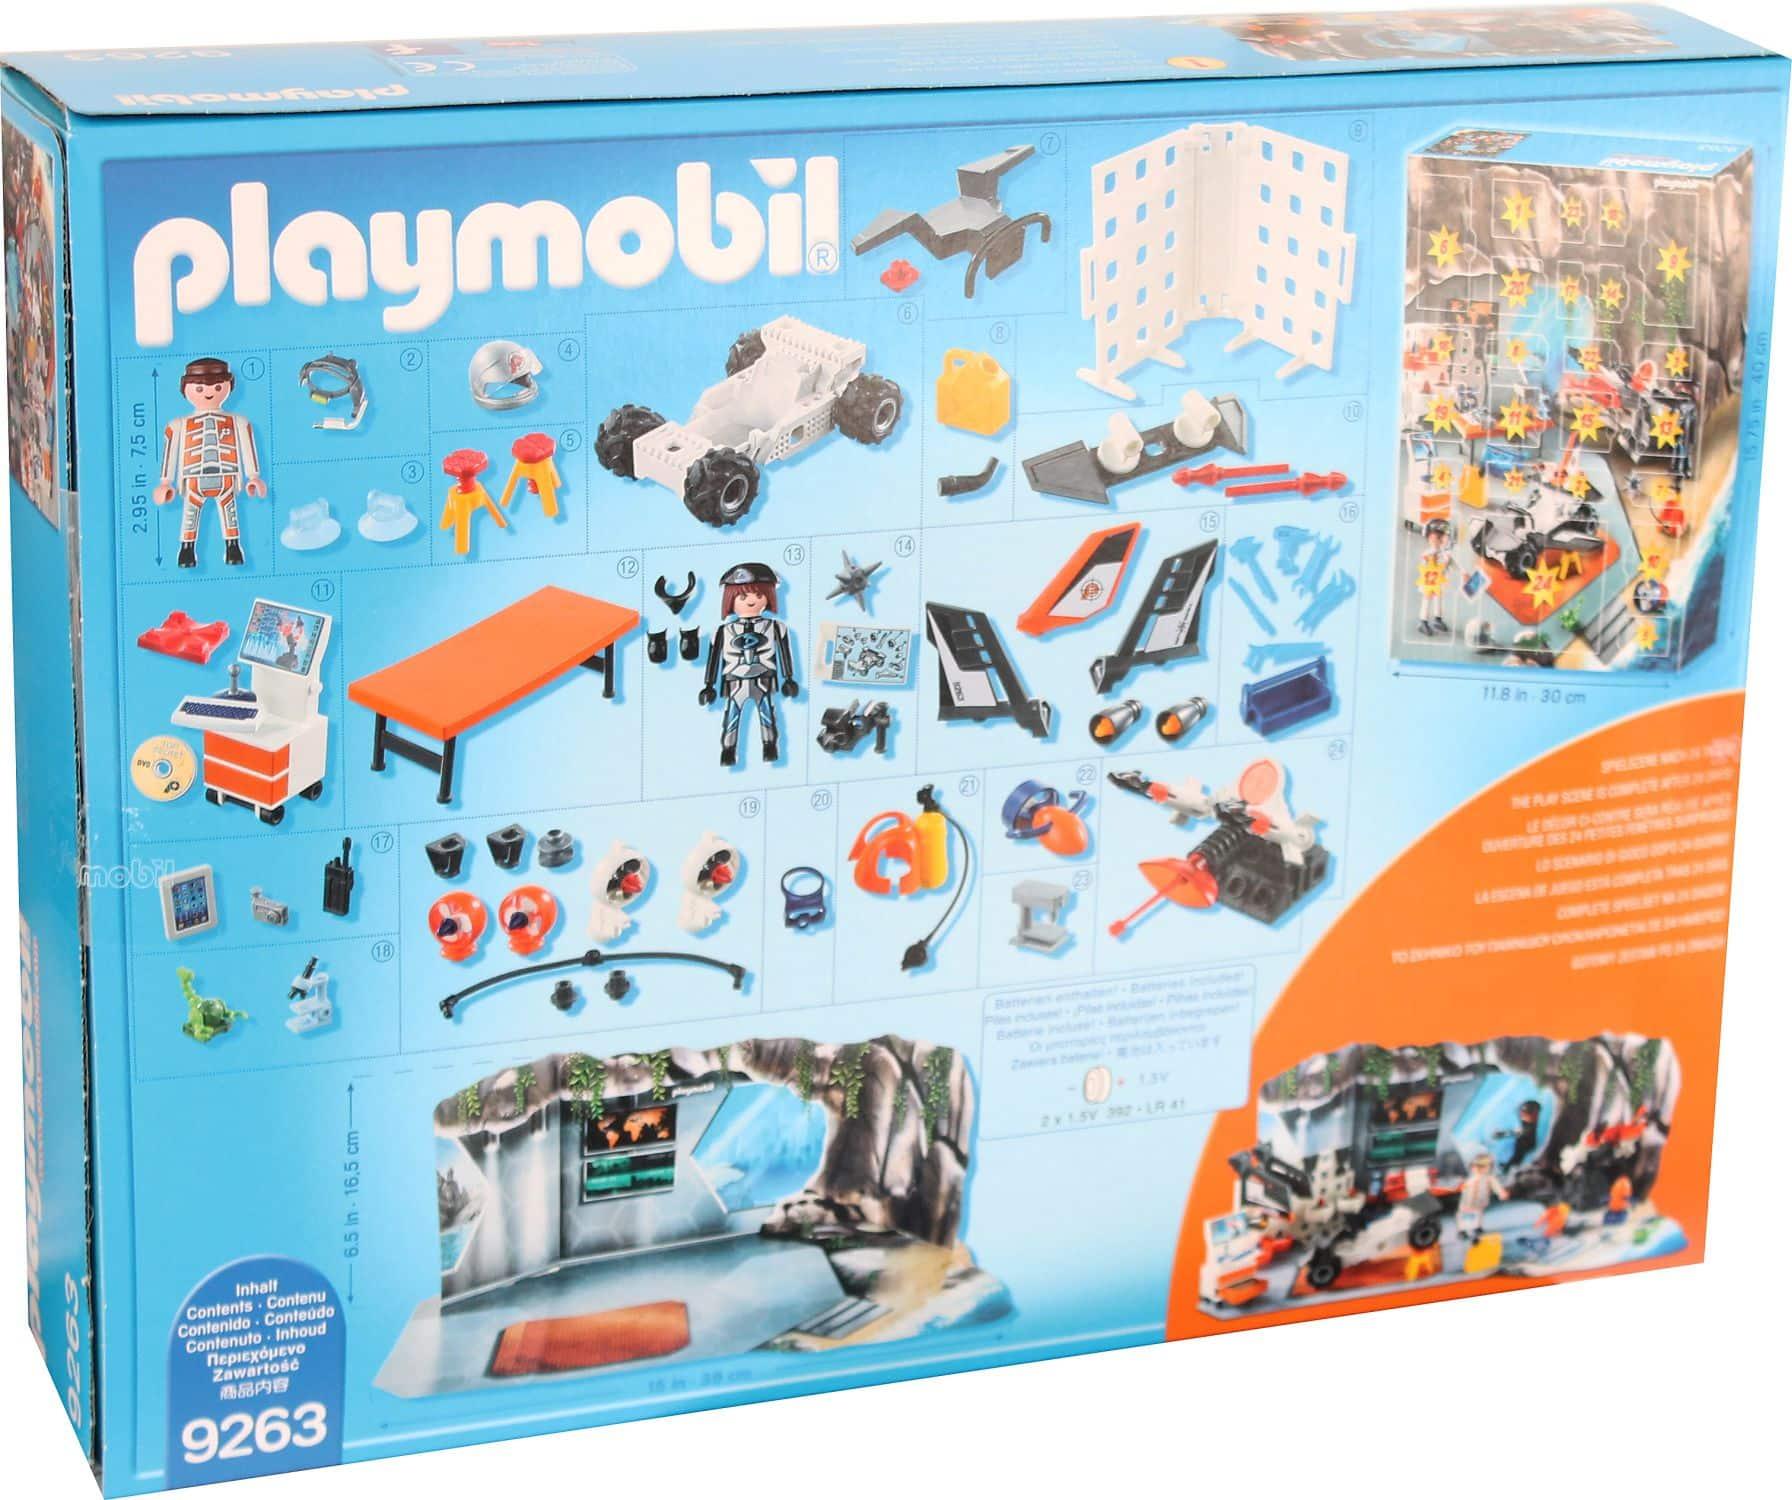 playmobil weihnachtskalender